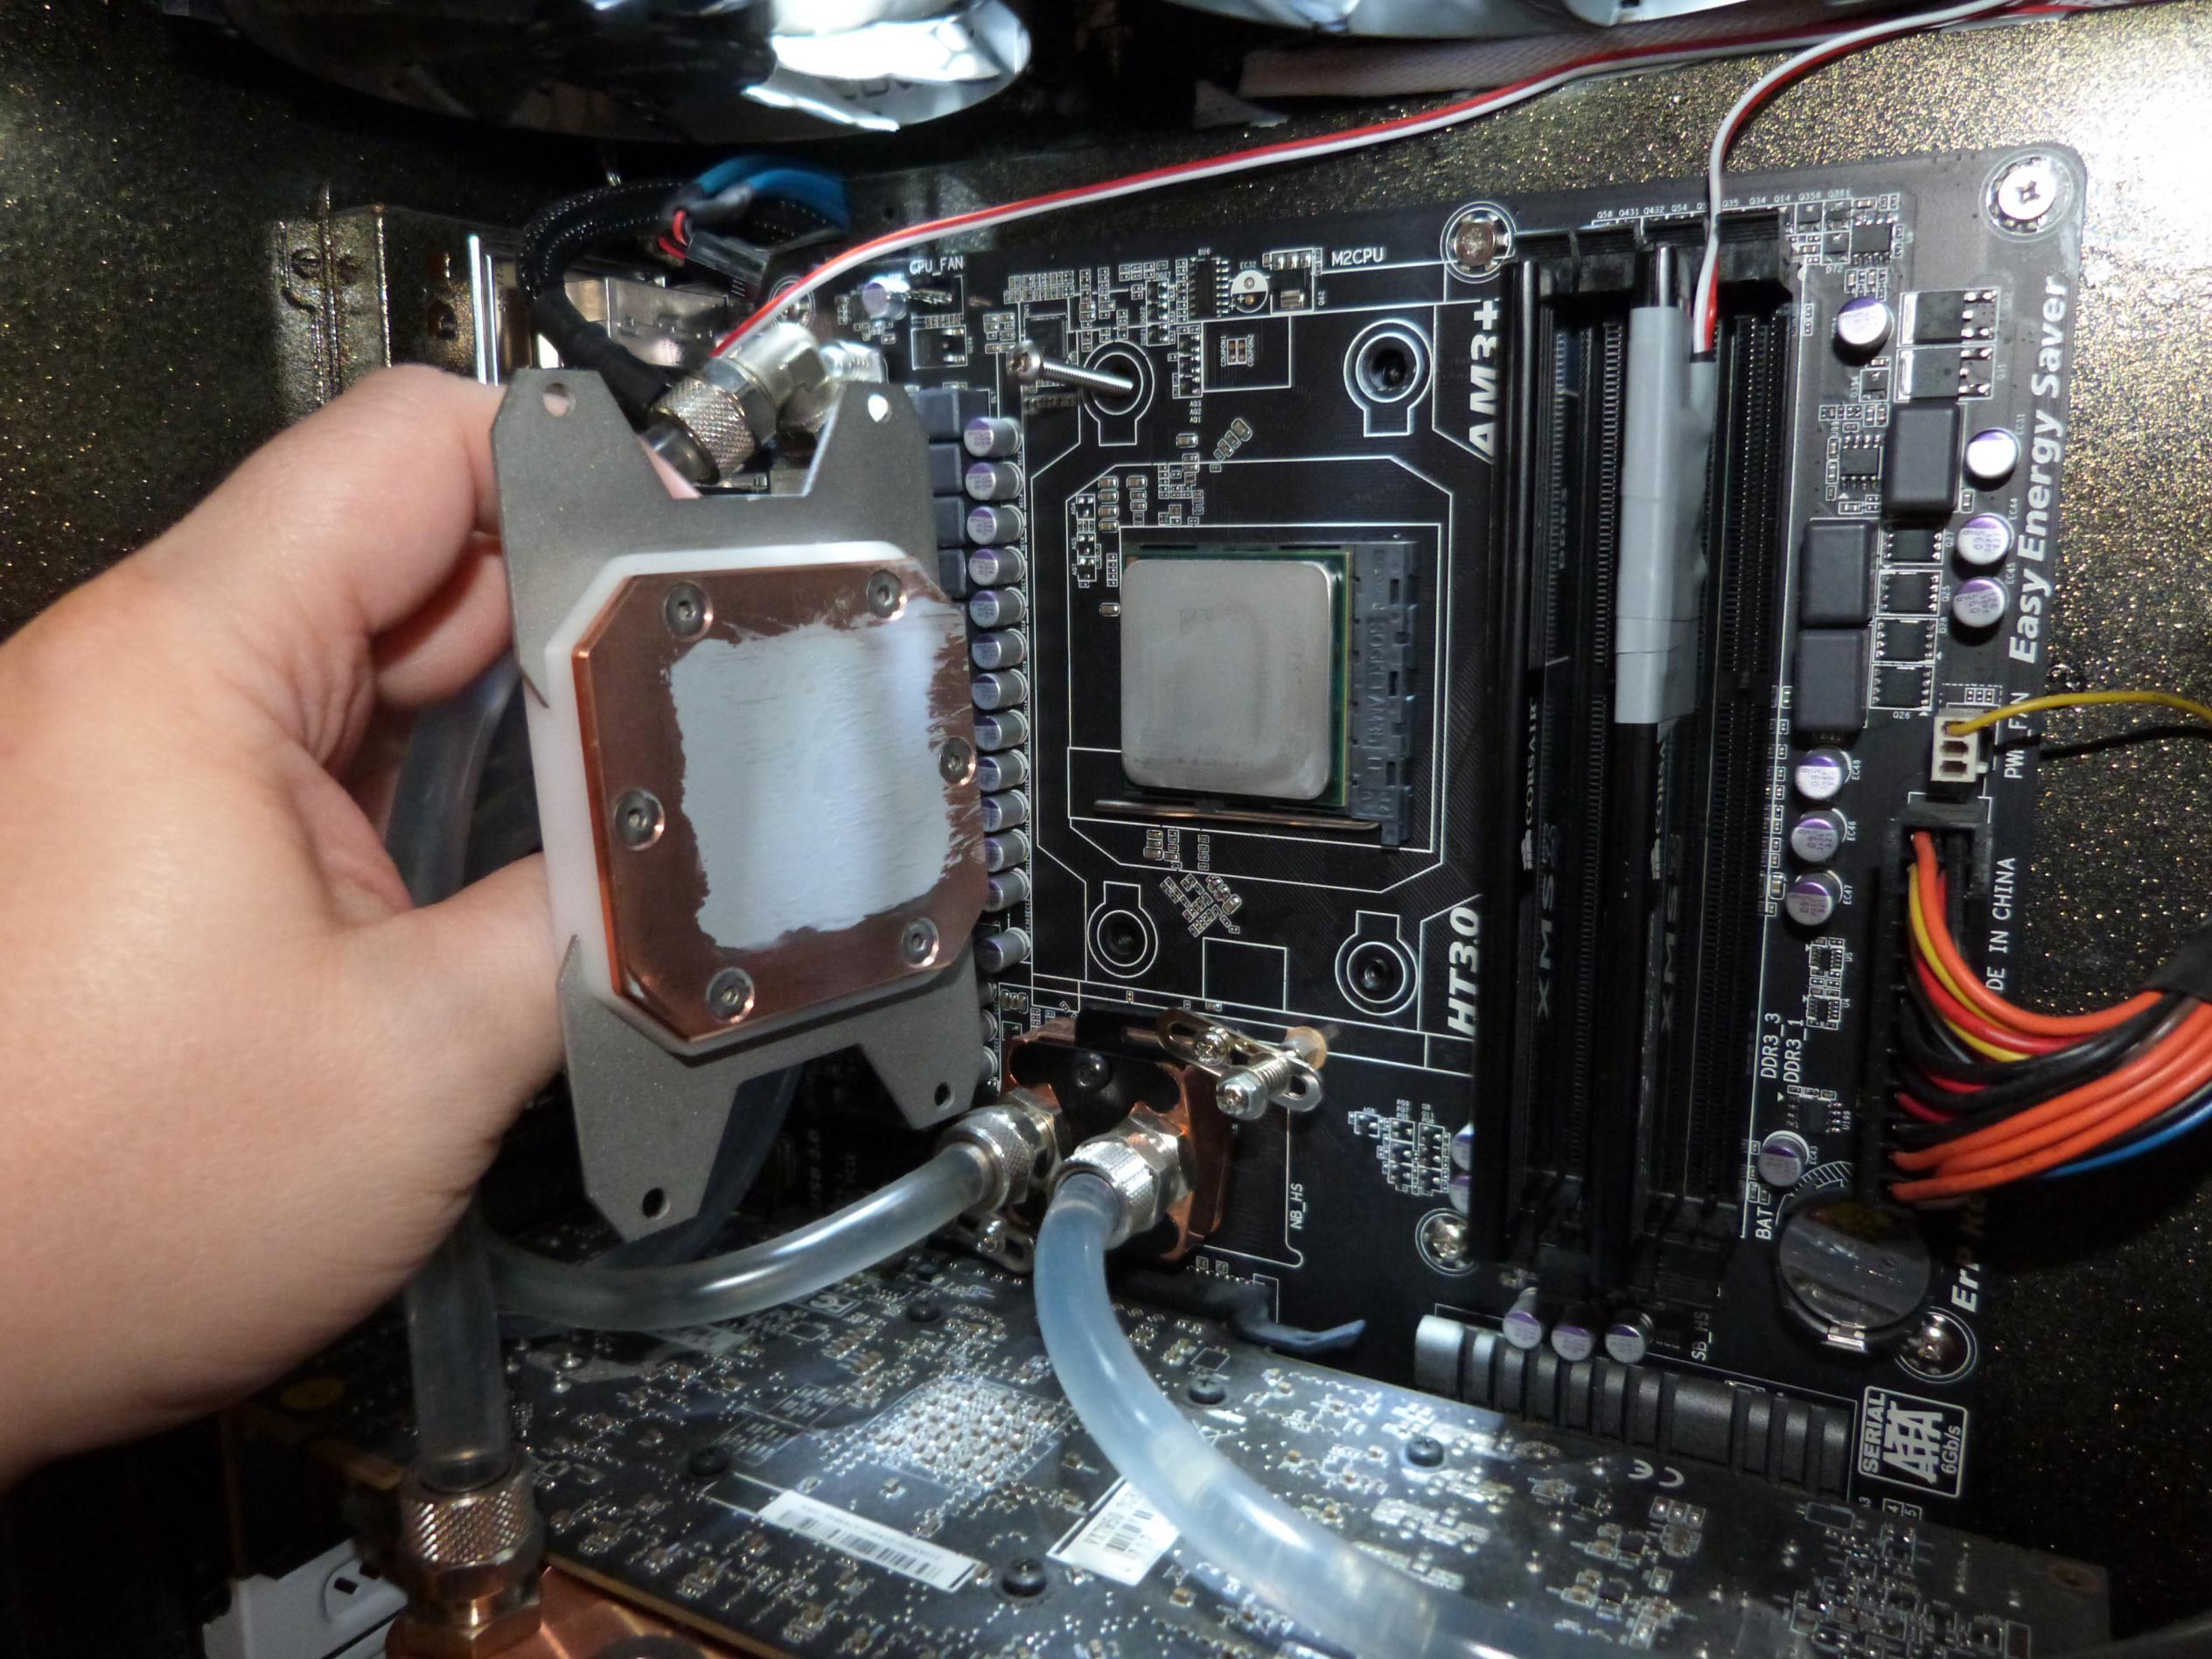 AMD A10-6800k - Temperatur zu hoch, Lüfter zu laut | ComputerBase Forum